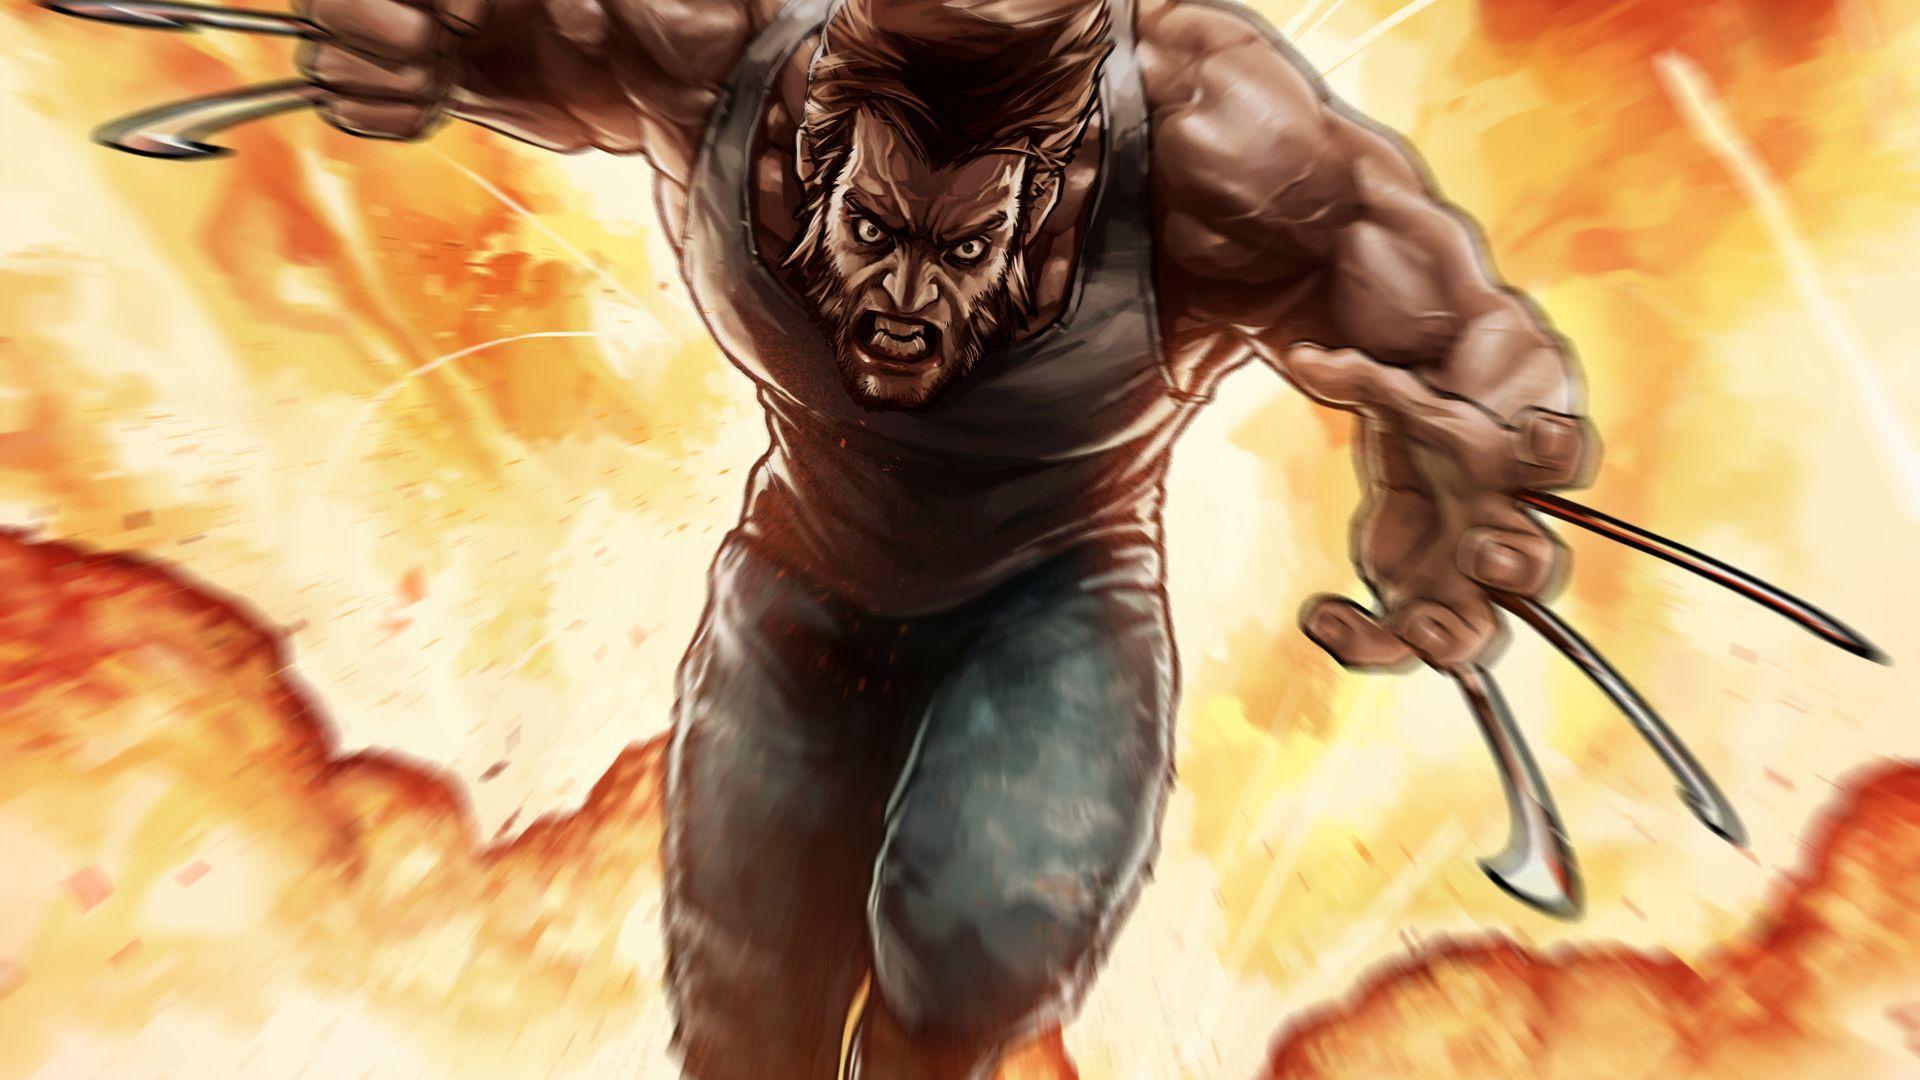 Wallpaper Angry Wolverine, X-men, marvel comics, fan art